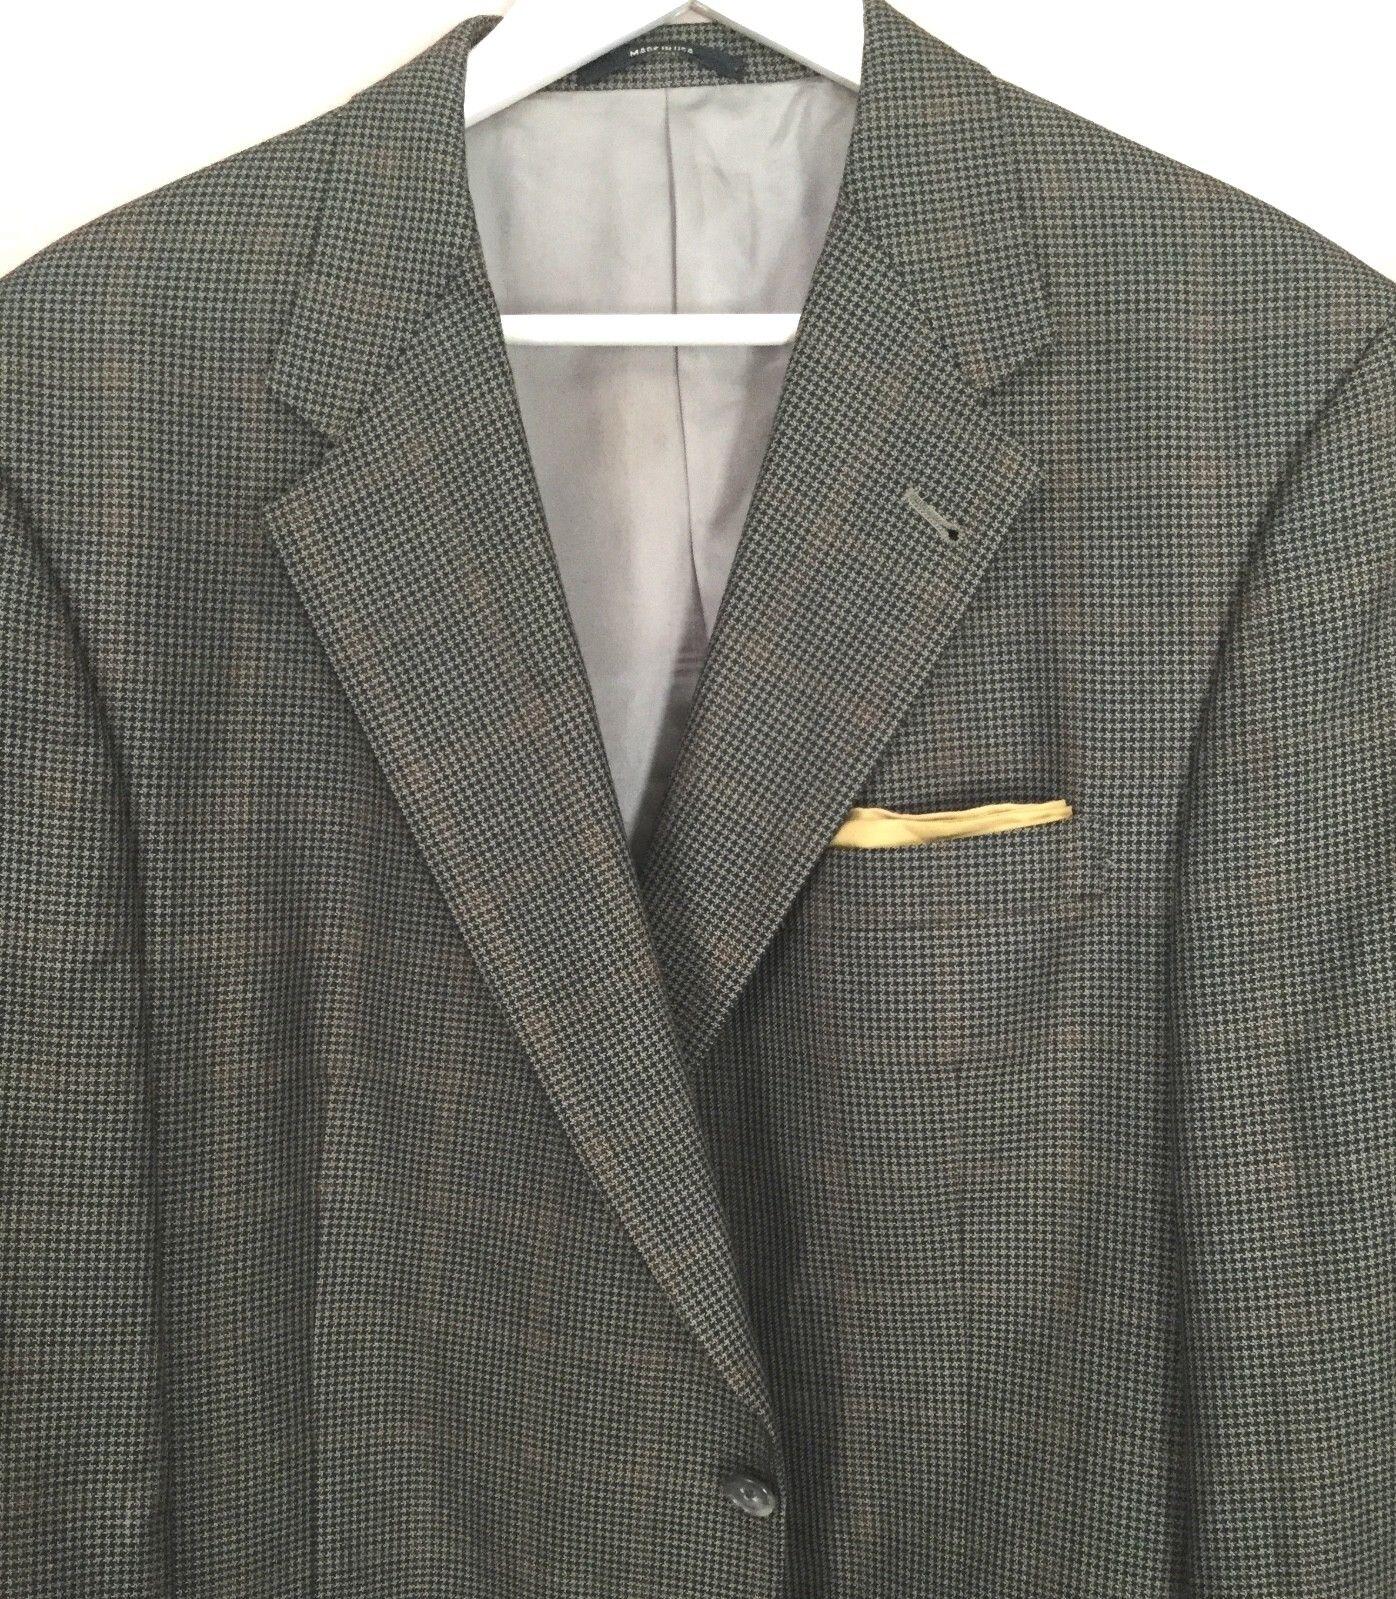 Hart Schaffner Marx Multi color Shadow Window Pane Spts Coat 46R Lux Silk   Wool